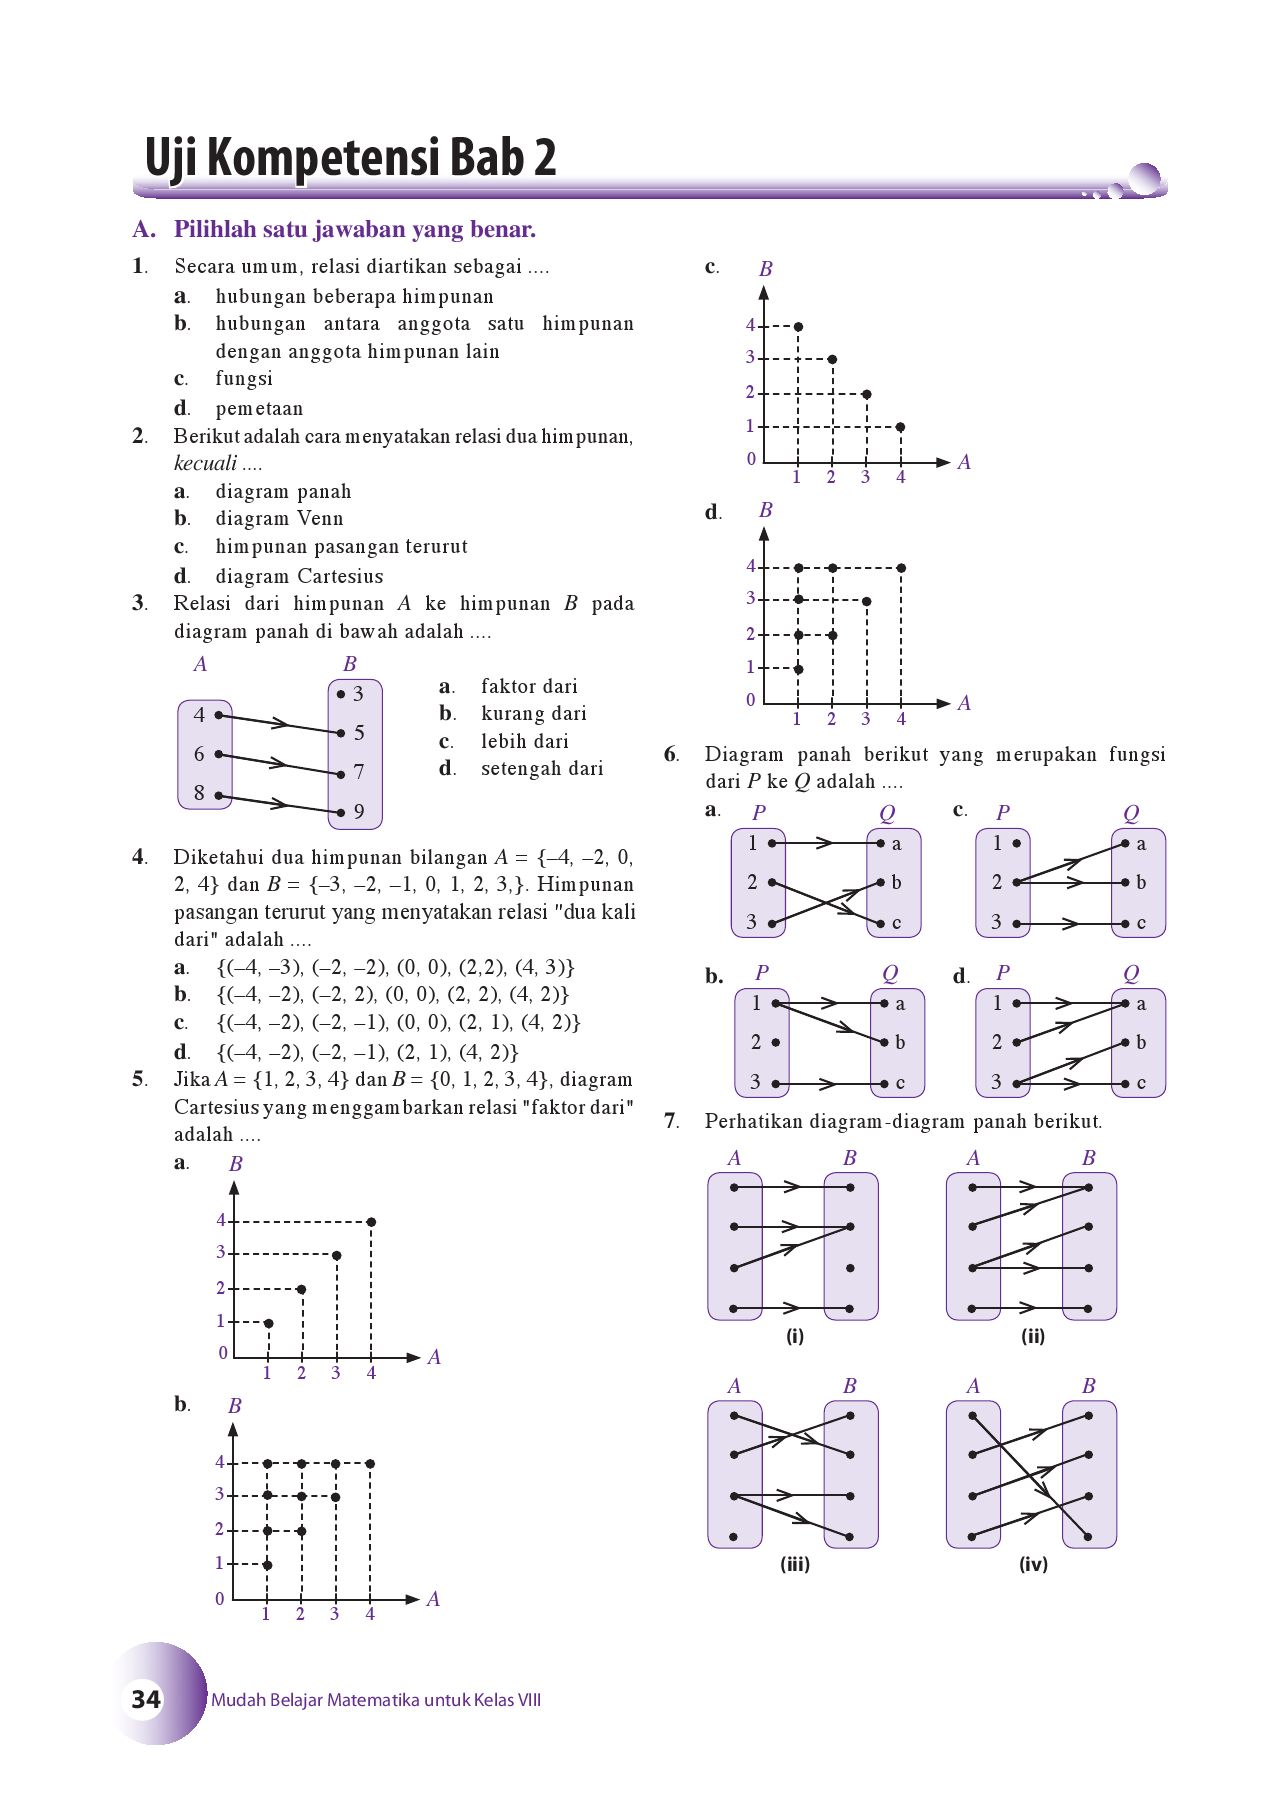 Kelas08mudah belajar matematikanuniek by s van selagan issuu ccuart Choice Image